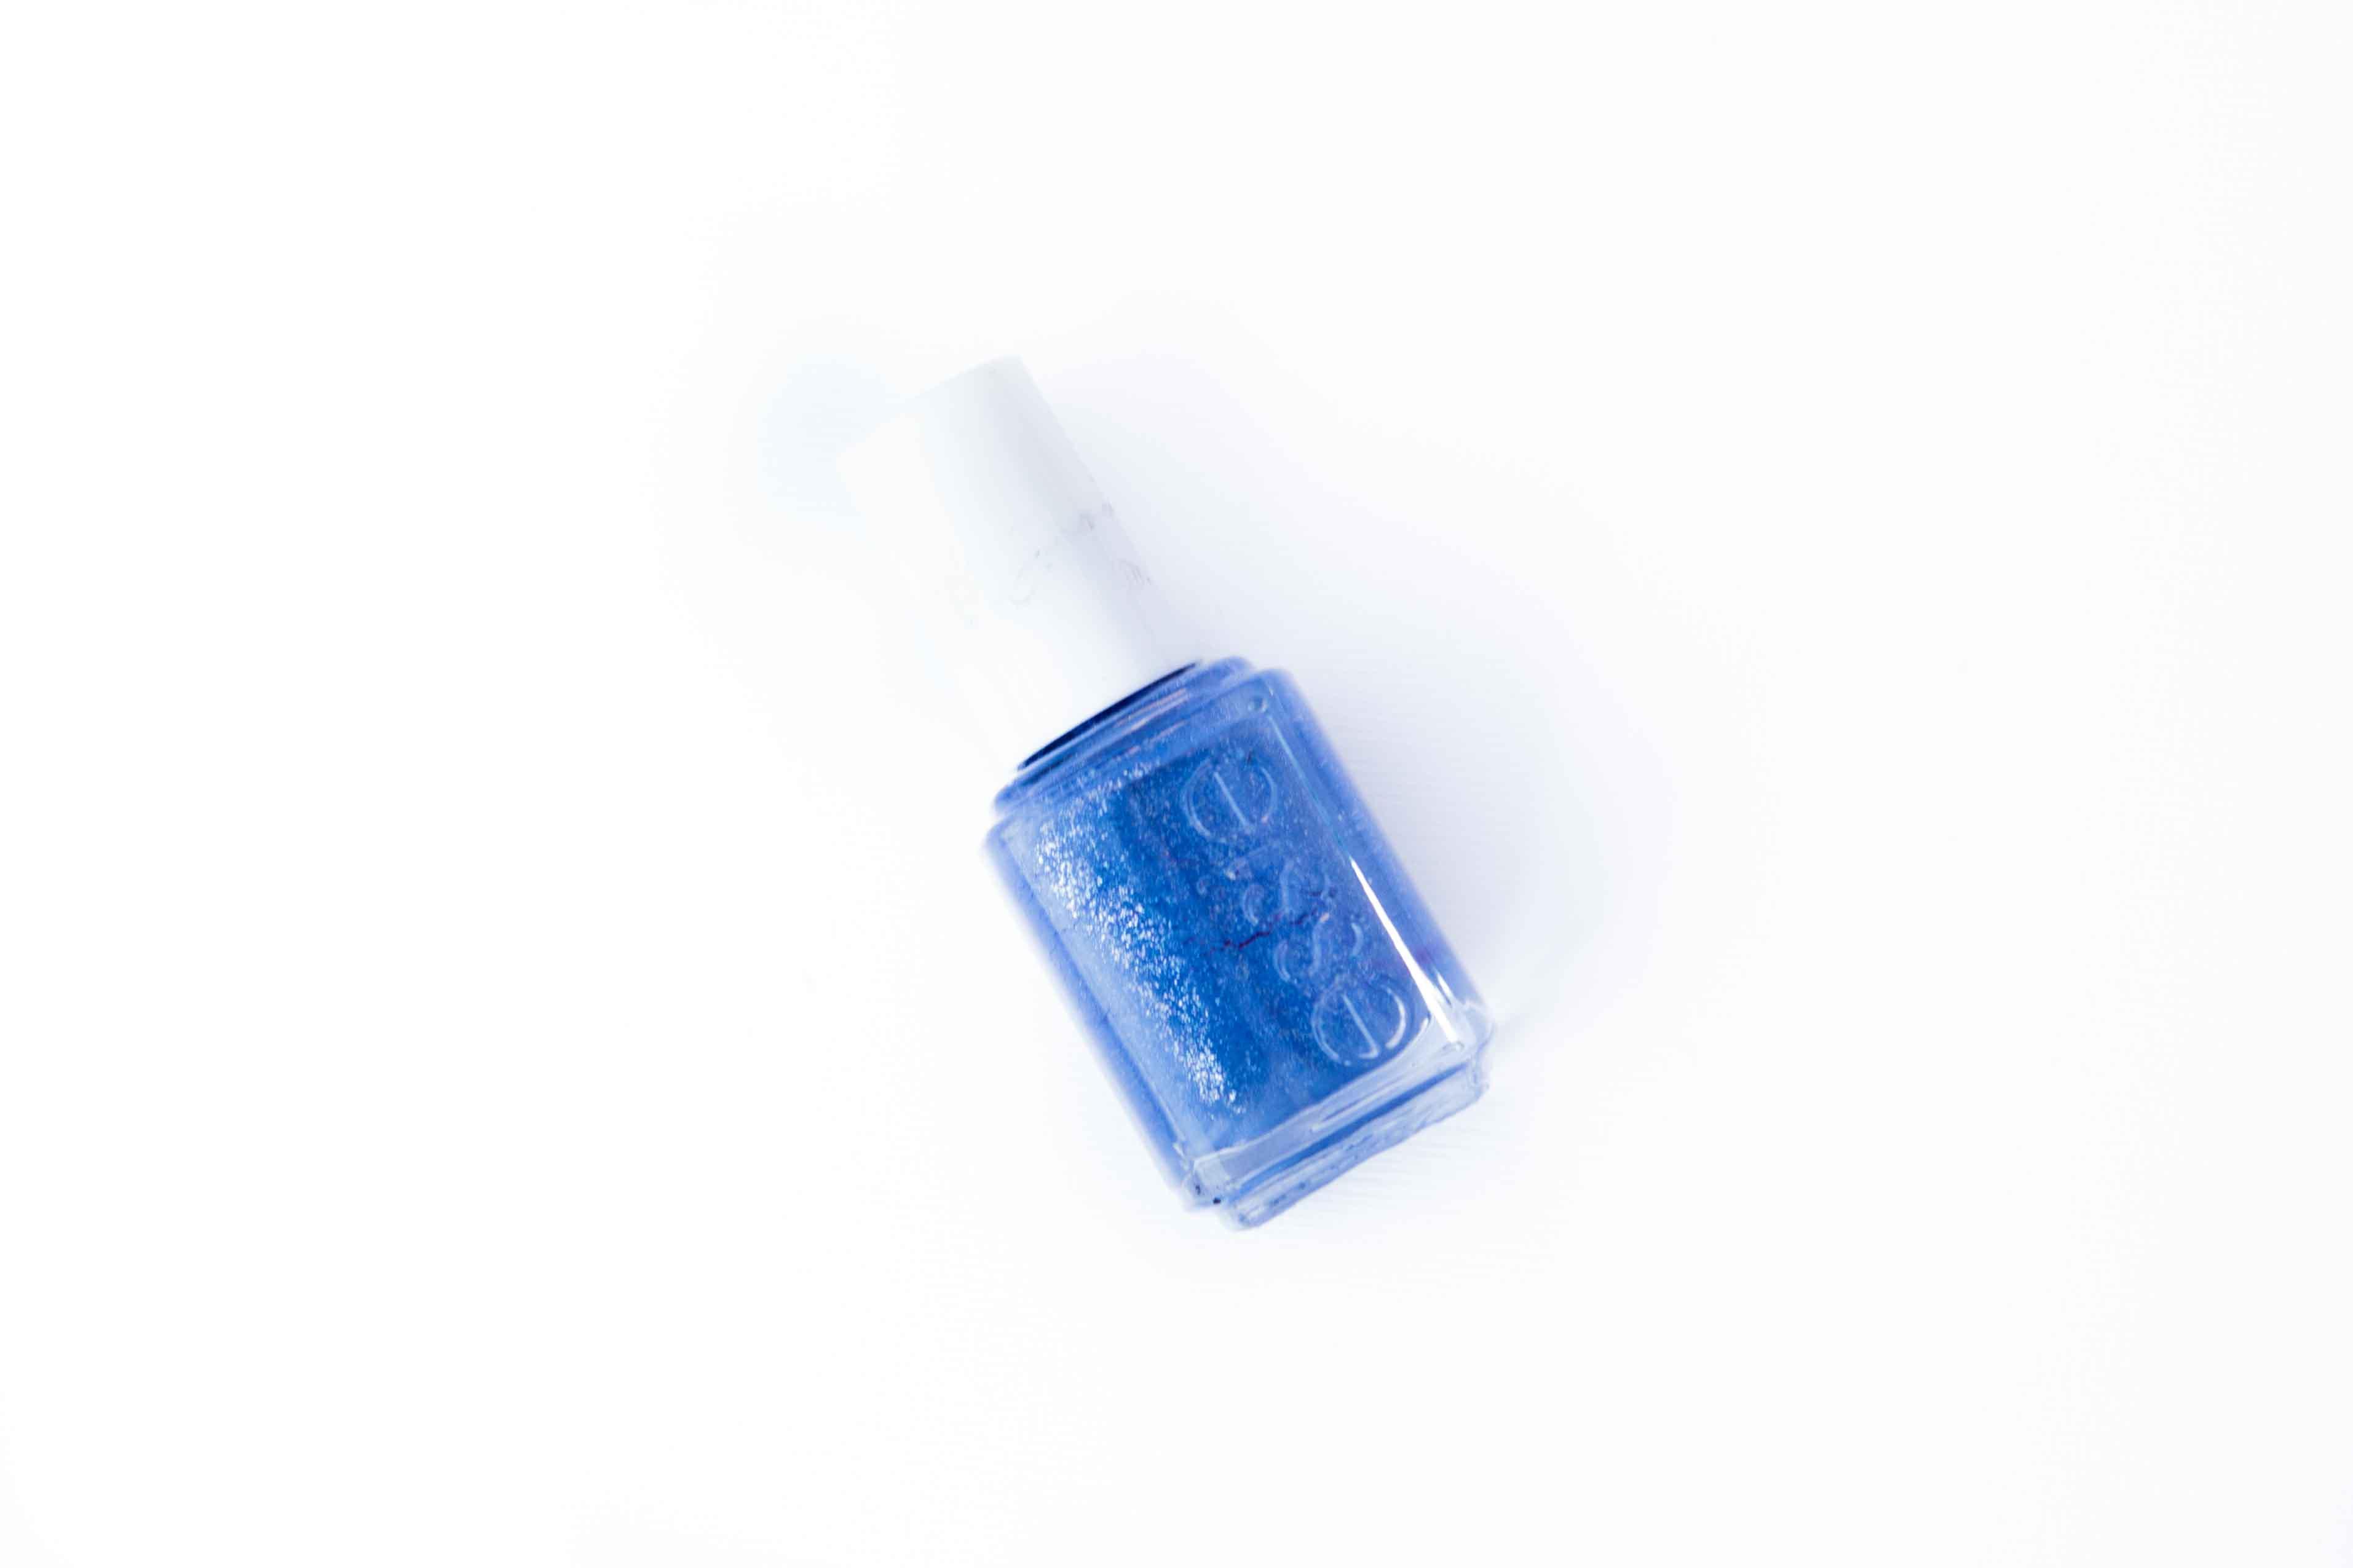 manicure at home nail polish essie Smooth Sailing